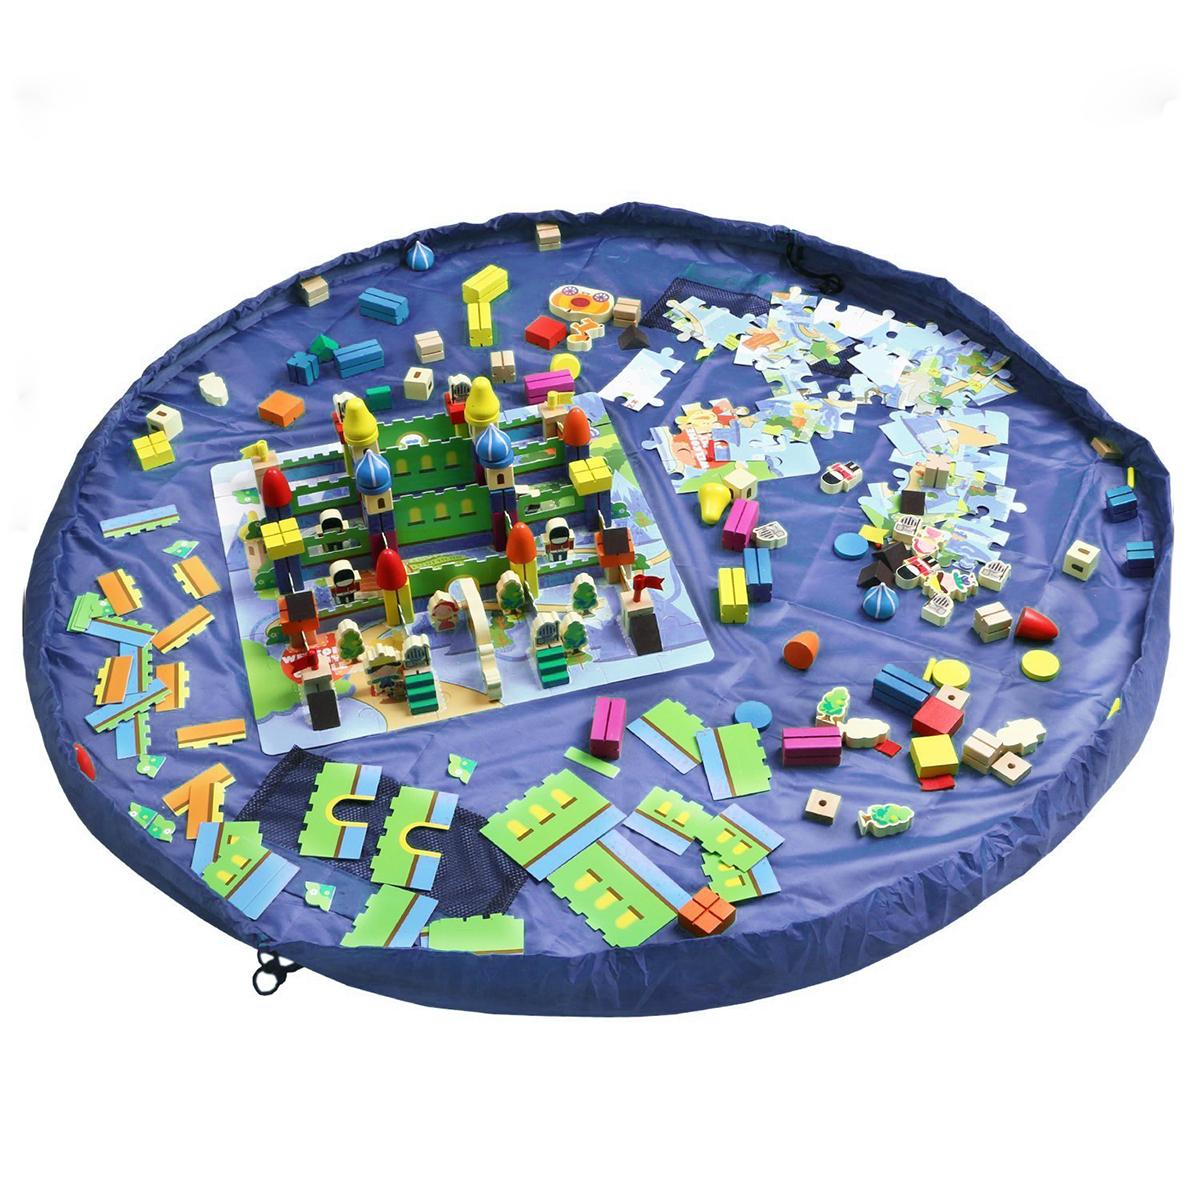 60 Childrens Floor Play Mat In Portable Shoulder Bag Toddlers Kids Toy Storage Organizer Net